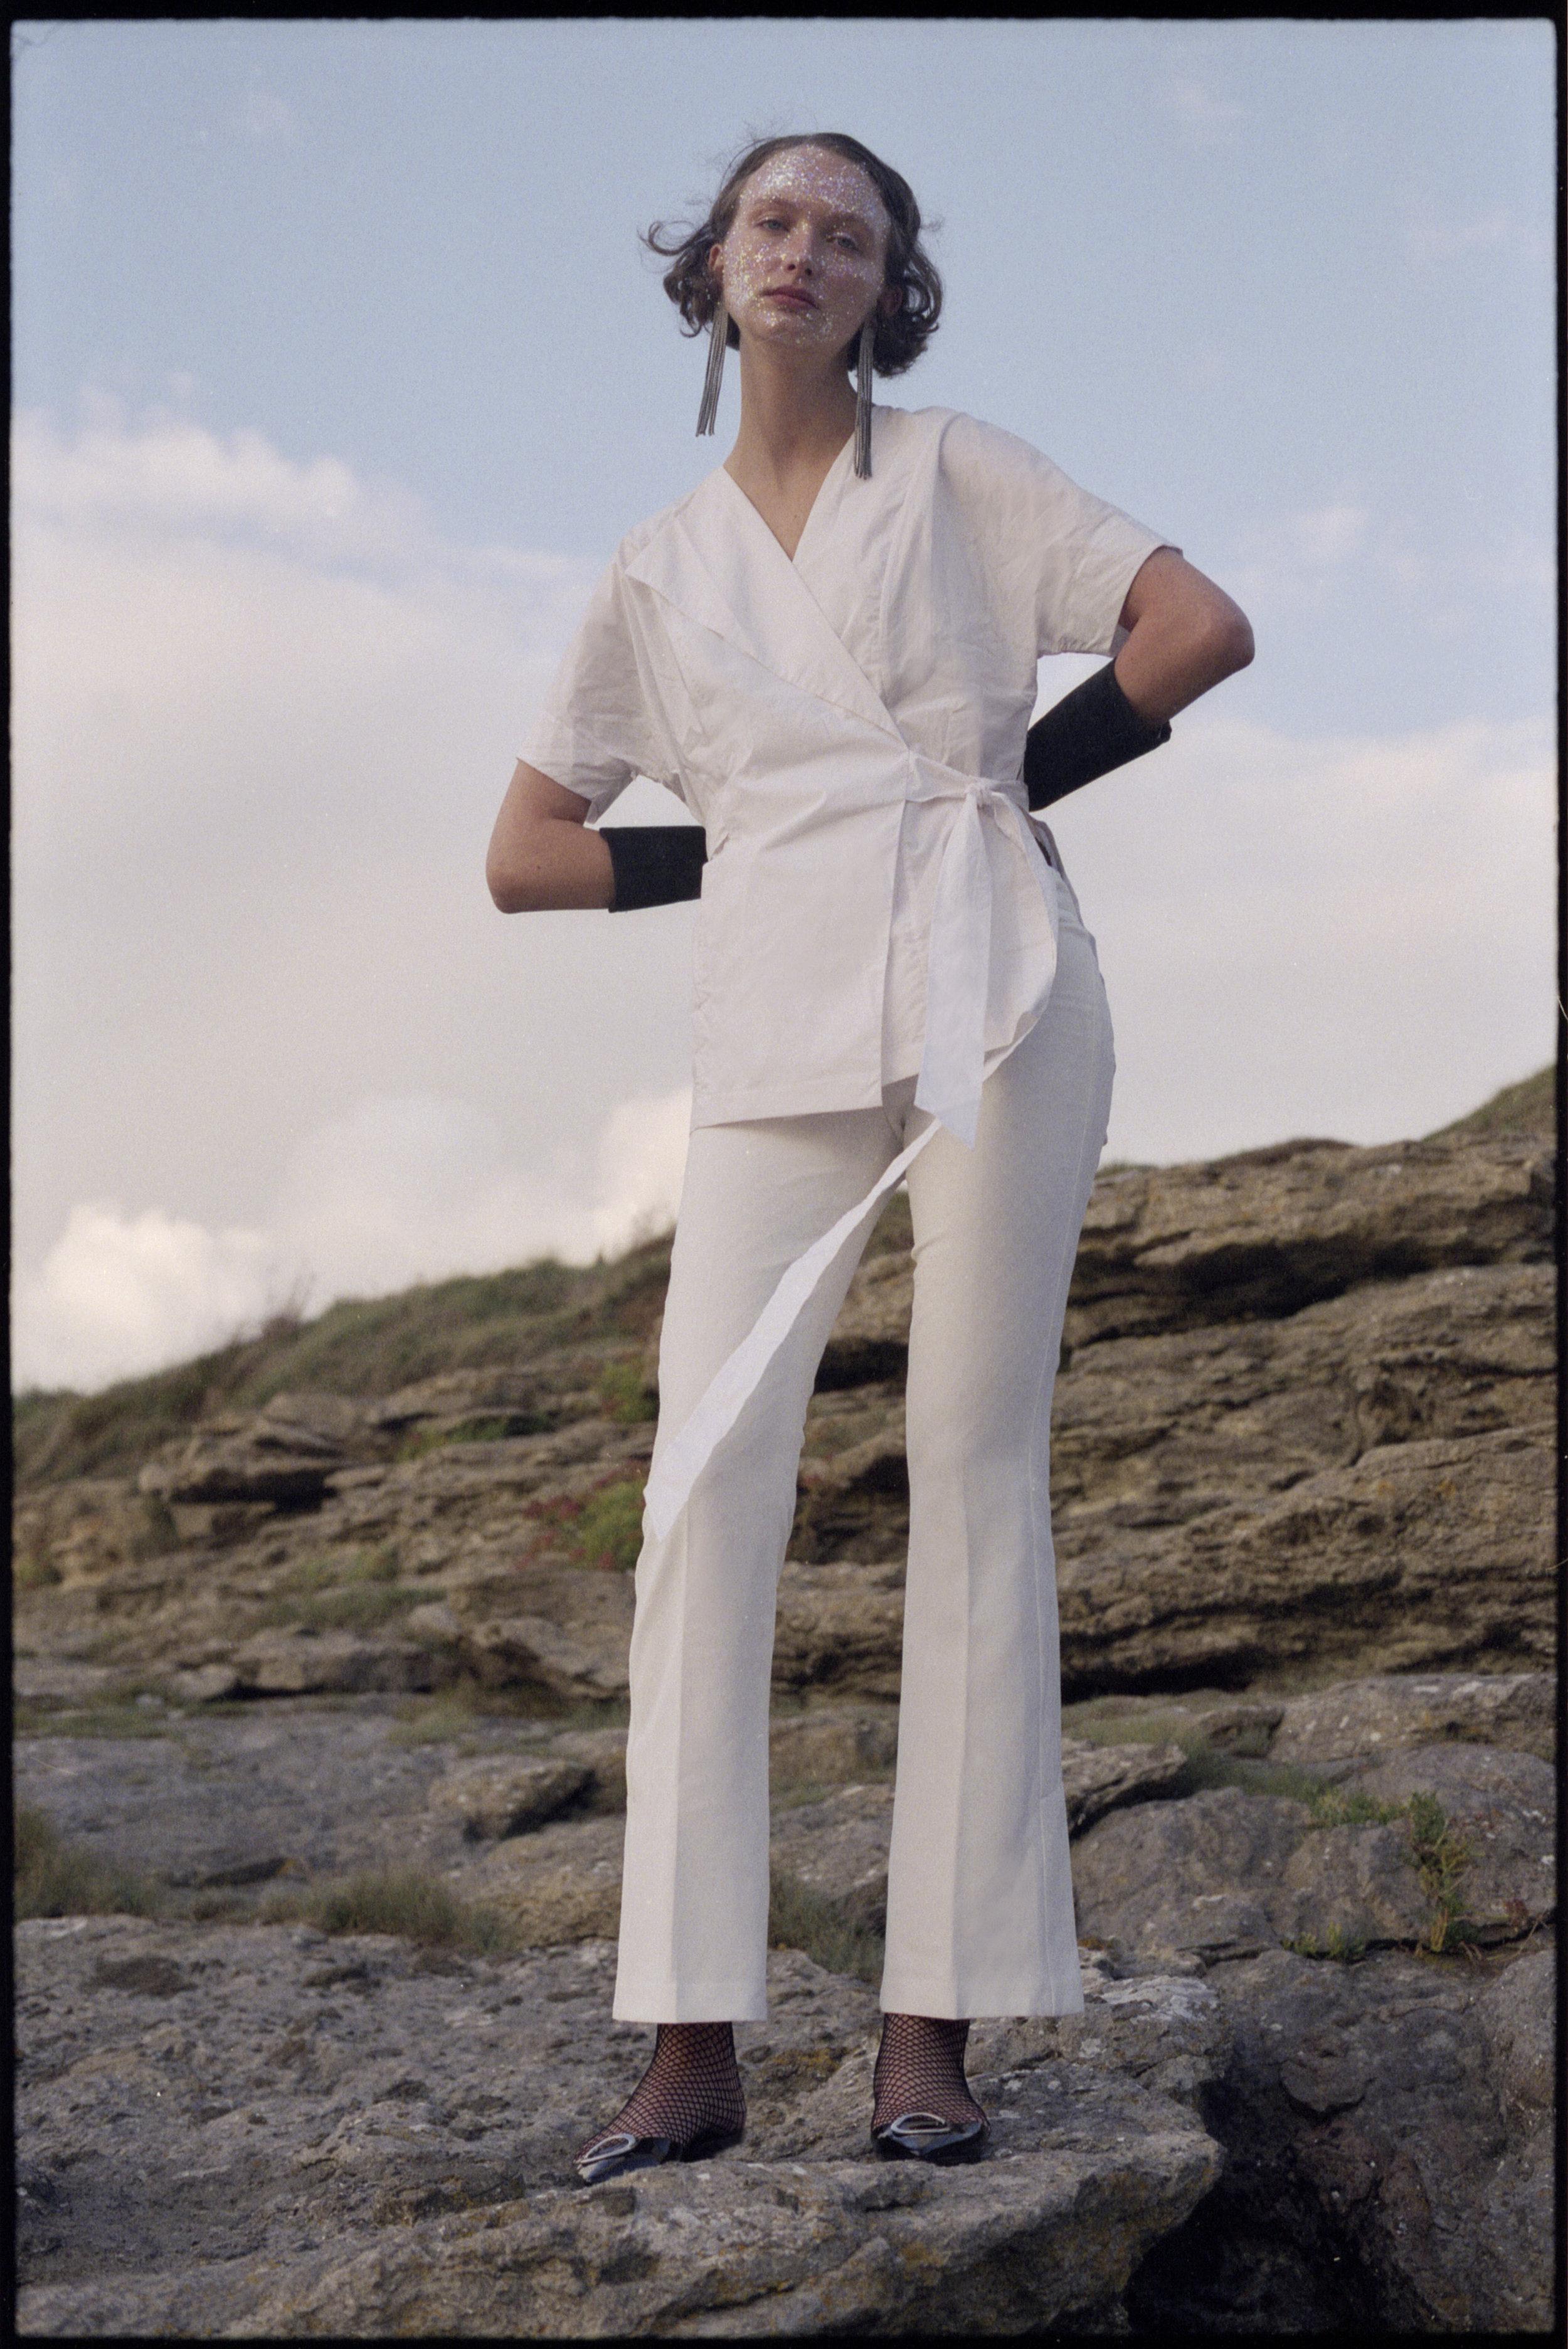 shirt  WHISTLES , trousers + gloves VINTAGE, earrings + shoes  ZARA